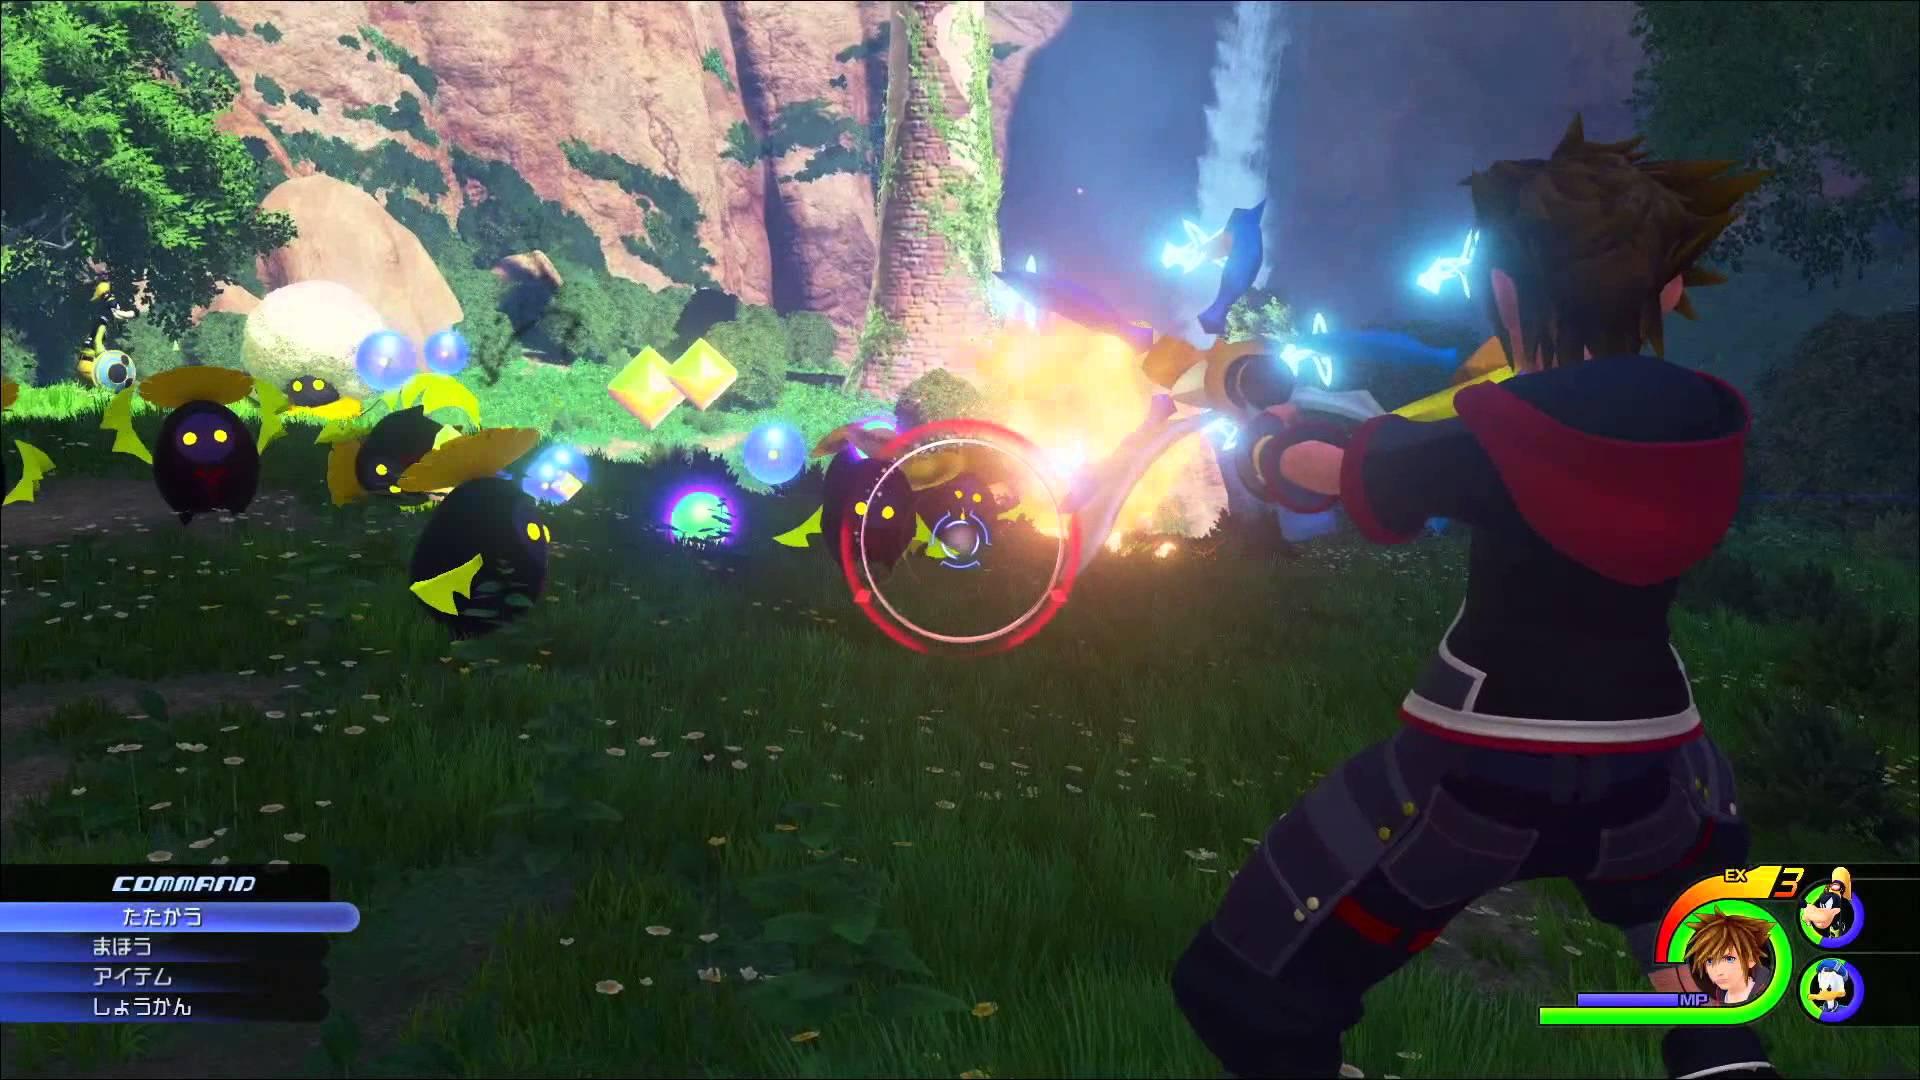 Kingdom Hearts III Trailer Released